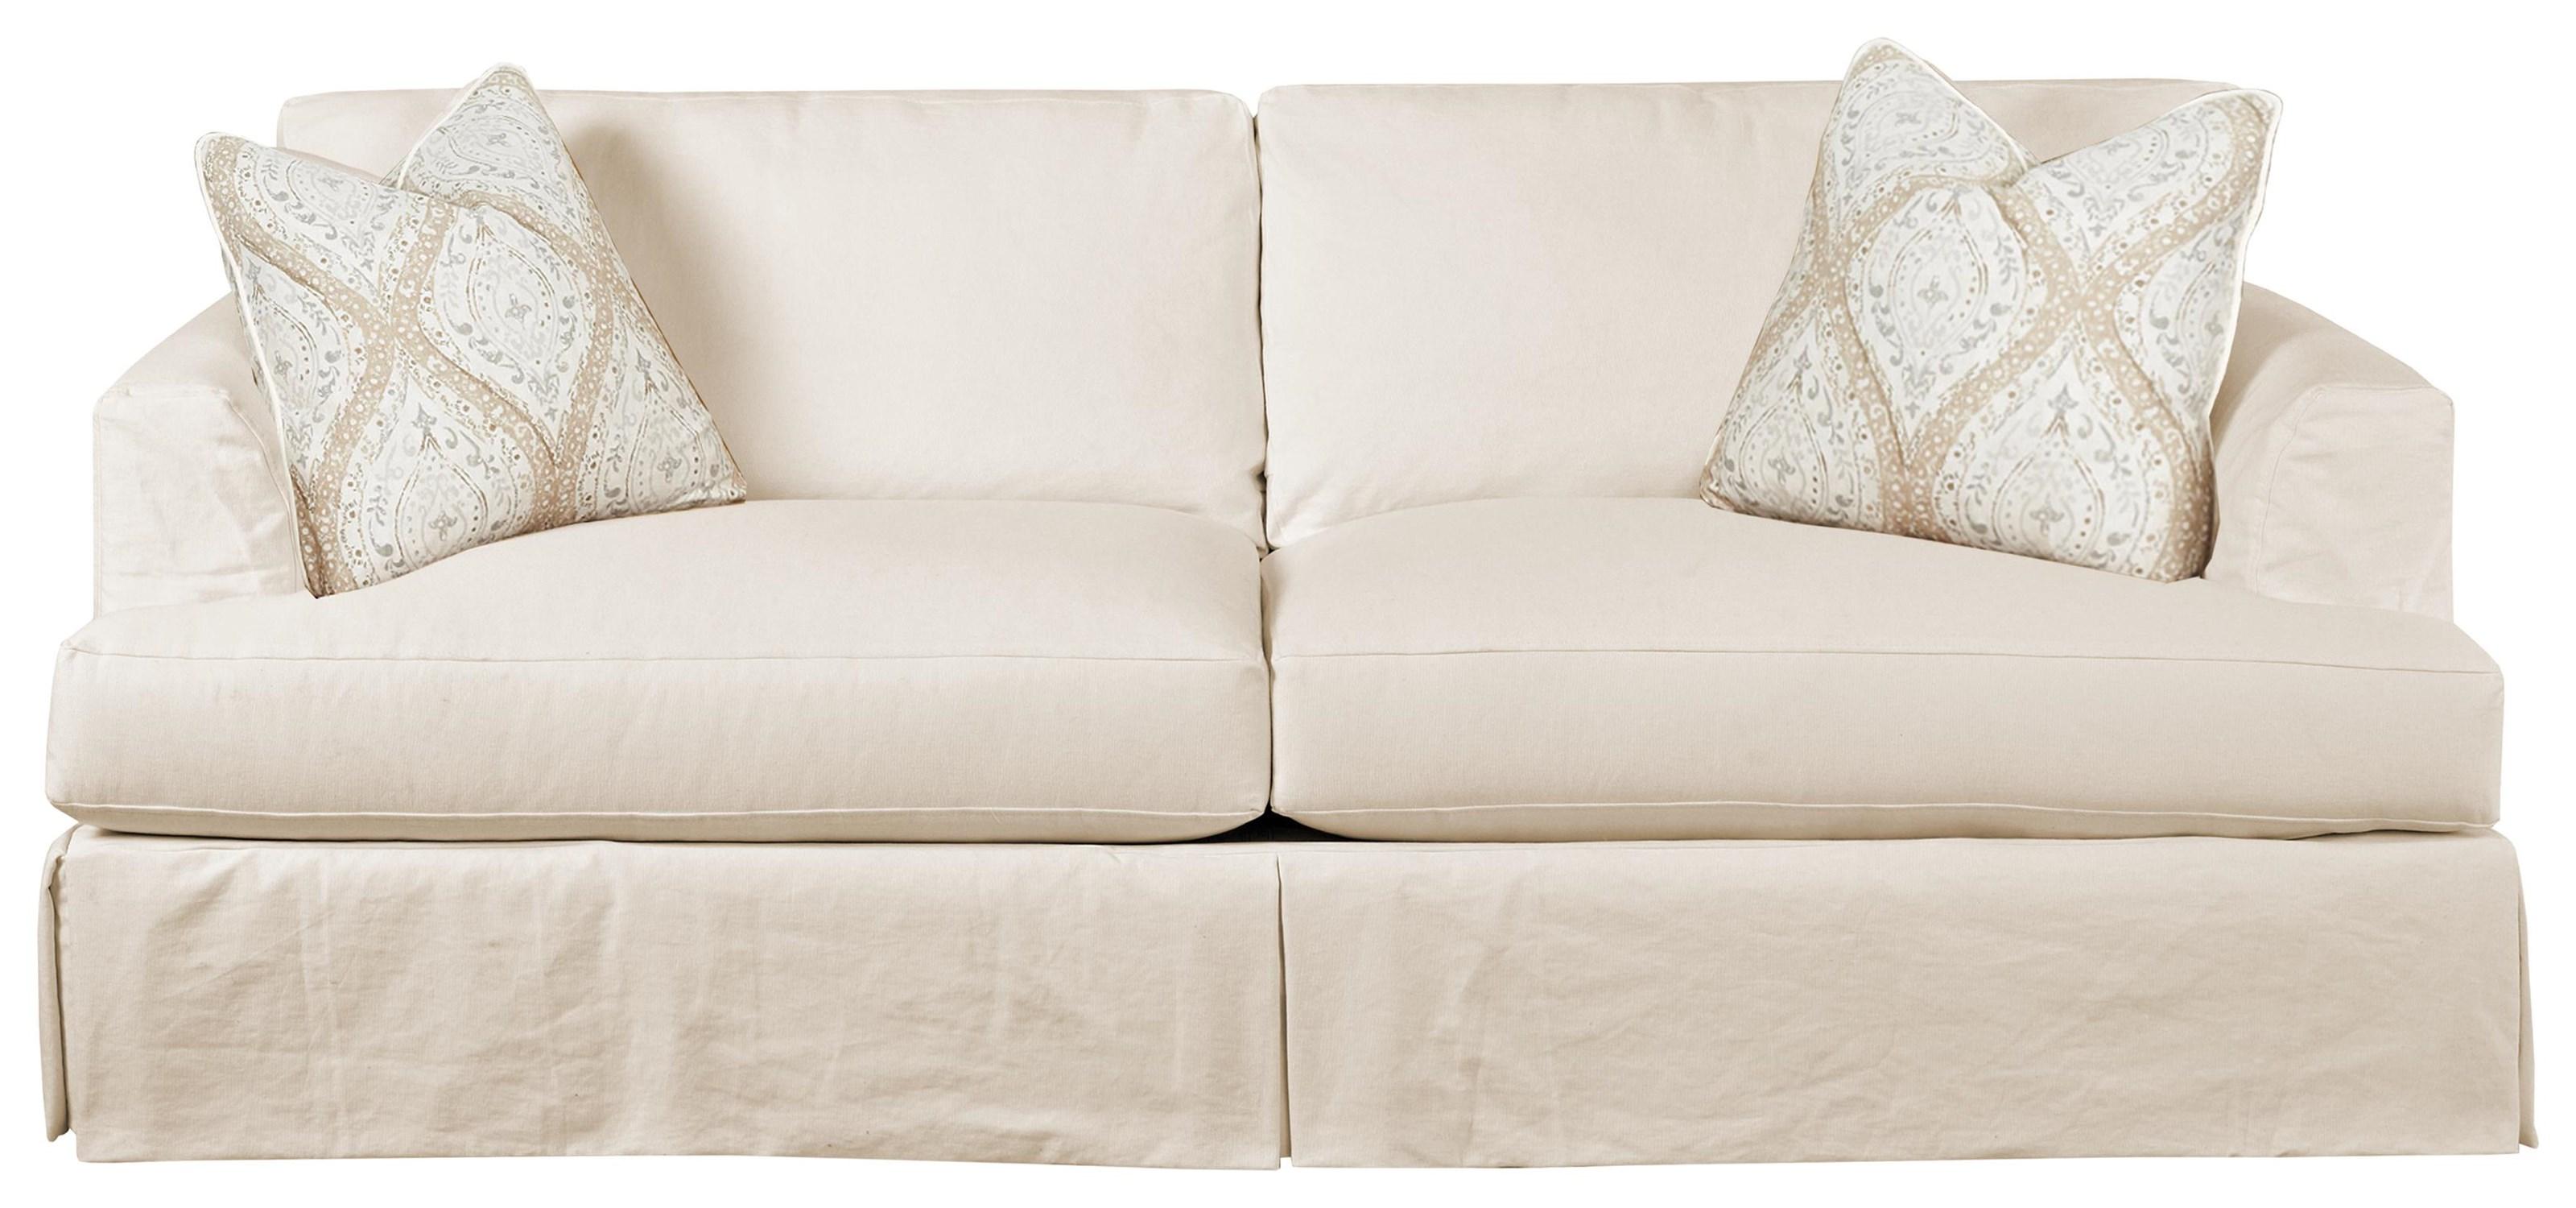 Addy Slipcover Sofa